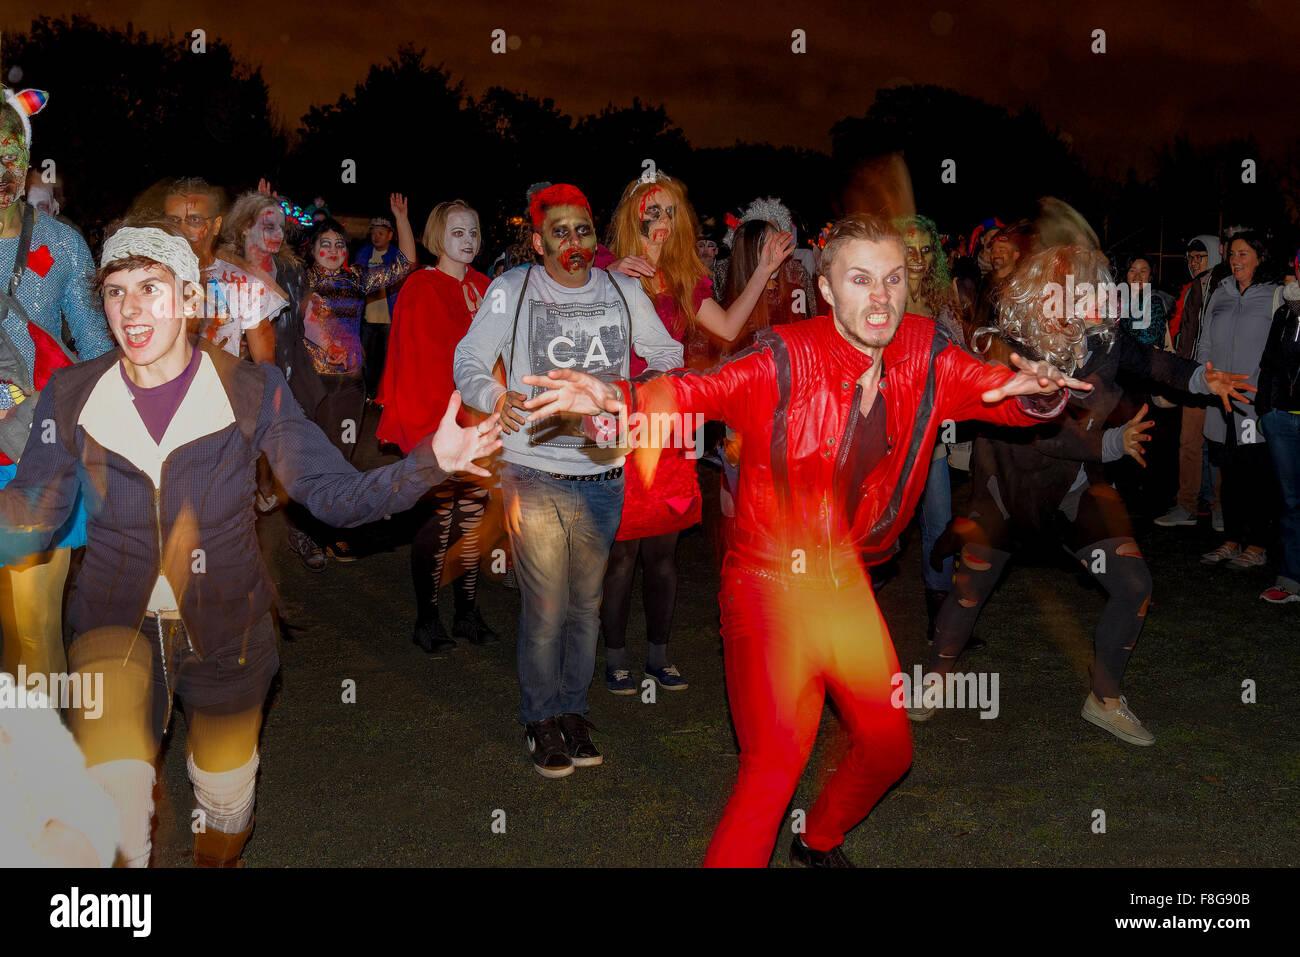 Zombie, thriller, flashmob danza. Desfile de las almas perdidas Festival 2014, barrio Commercial Drive, Vancouver, Imagen De Stock